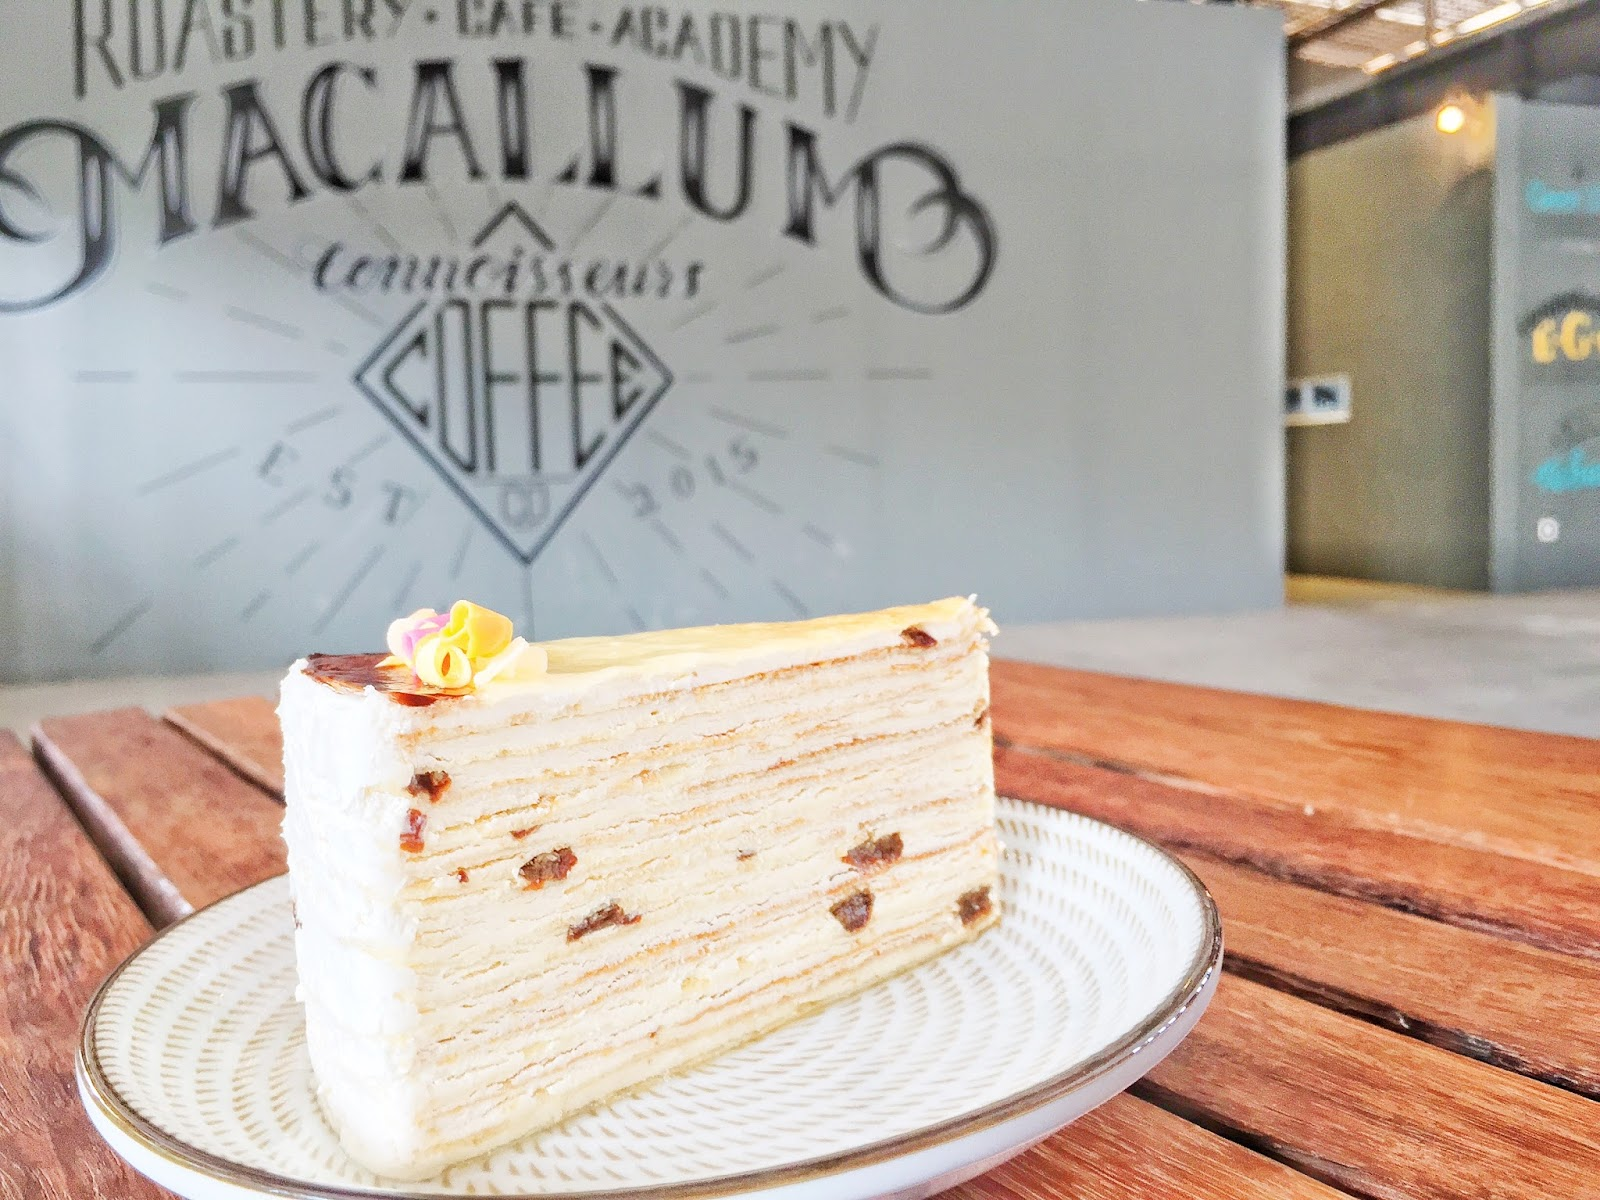 Penang Cafes - Macallum Get Drunk Raisin Crepe